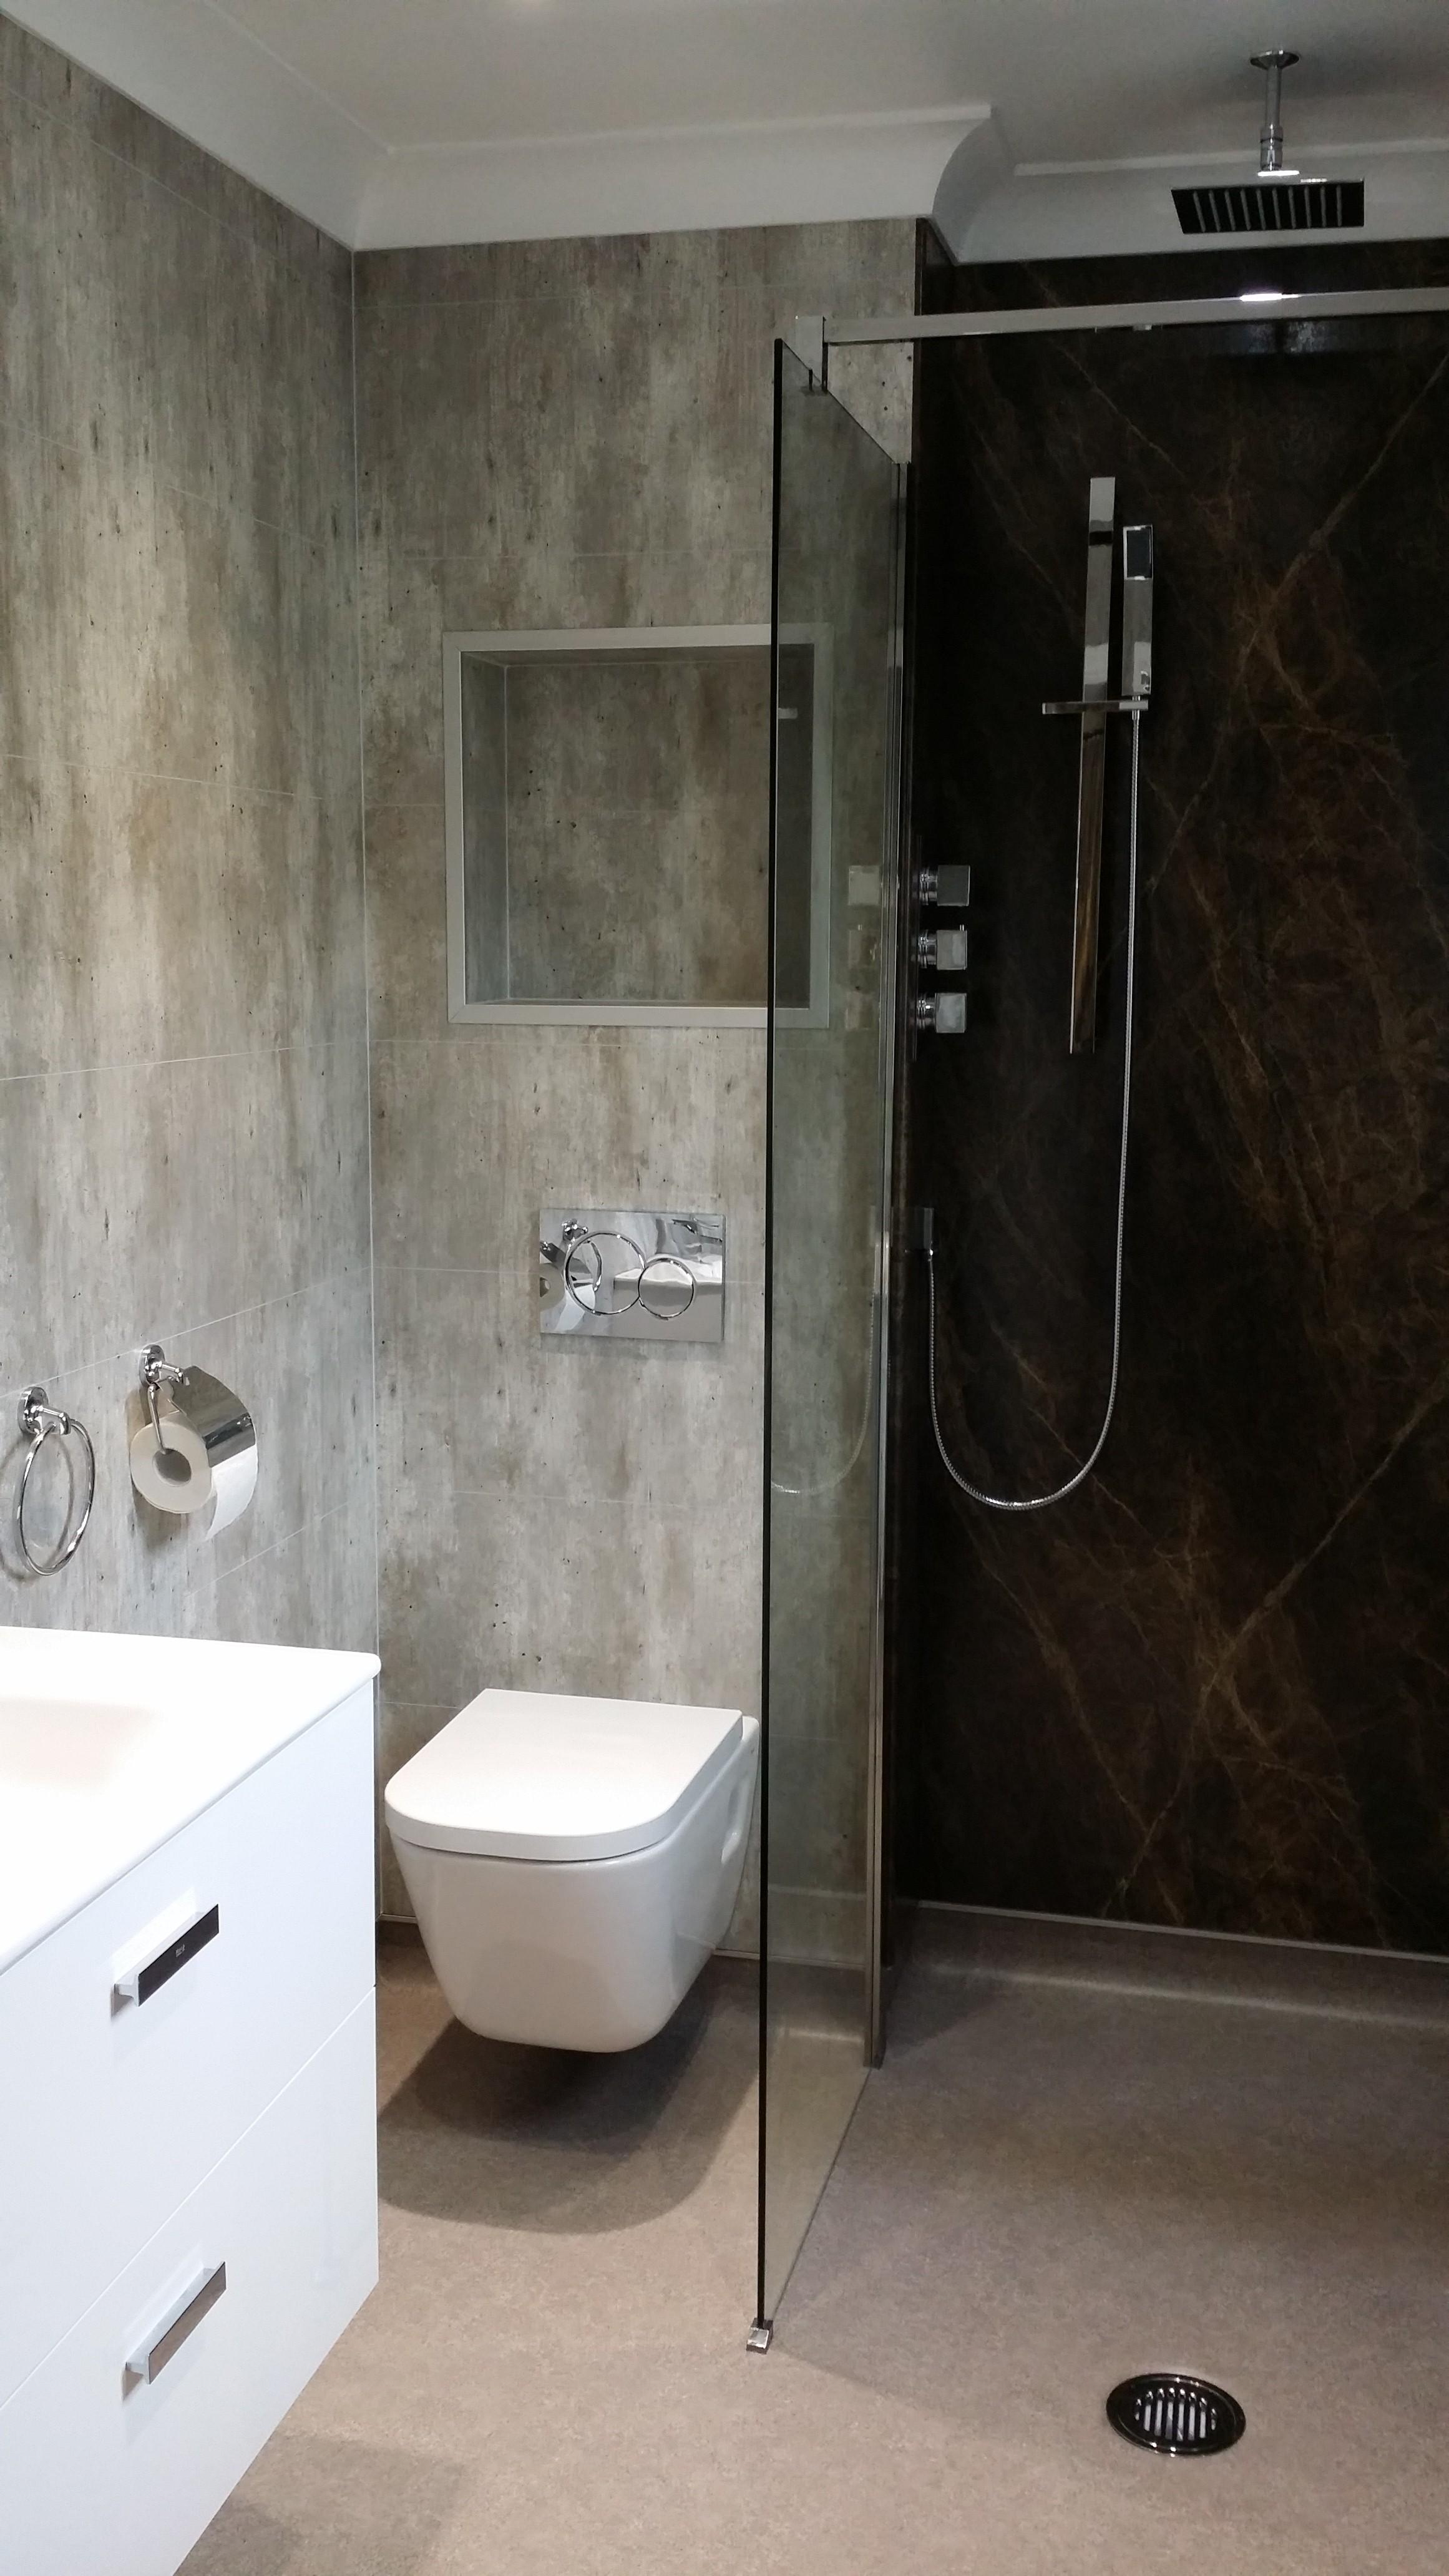 Blog the best disabled bathroom design the best disabled bathroom design dailygadgetfo Image collections